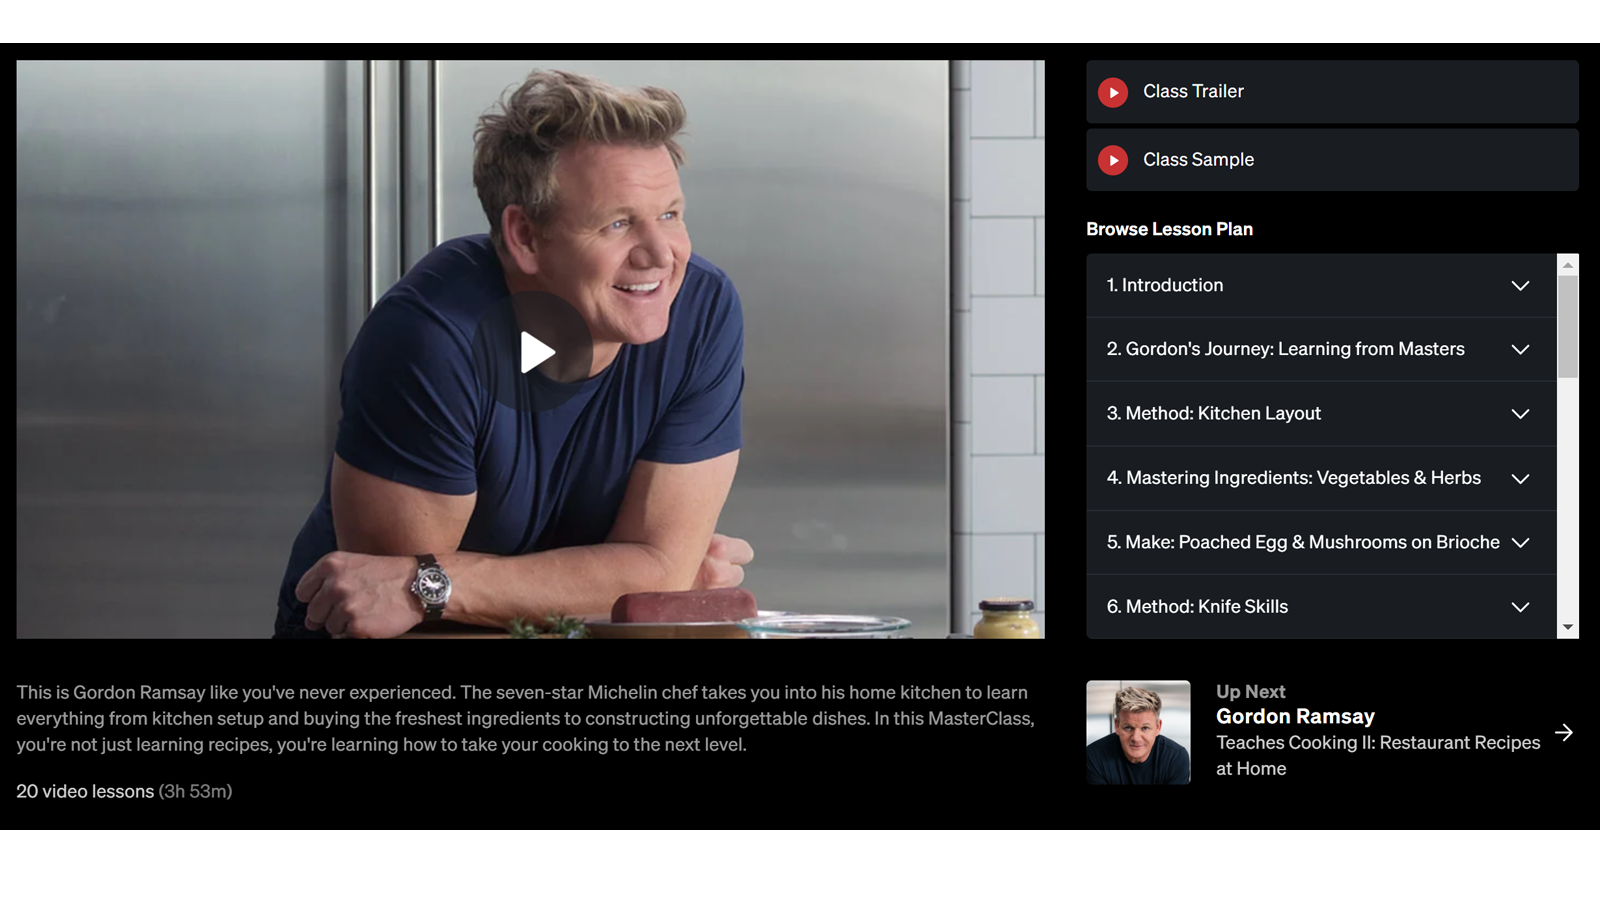 Chef Gordon Ramsay's MasterClass course overview